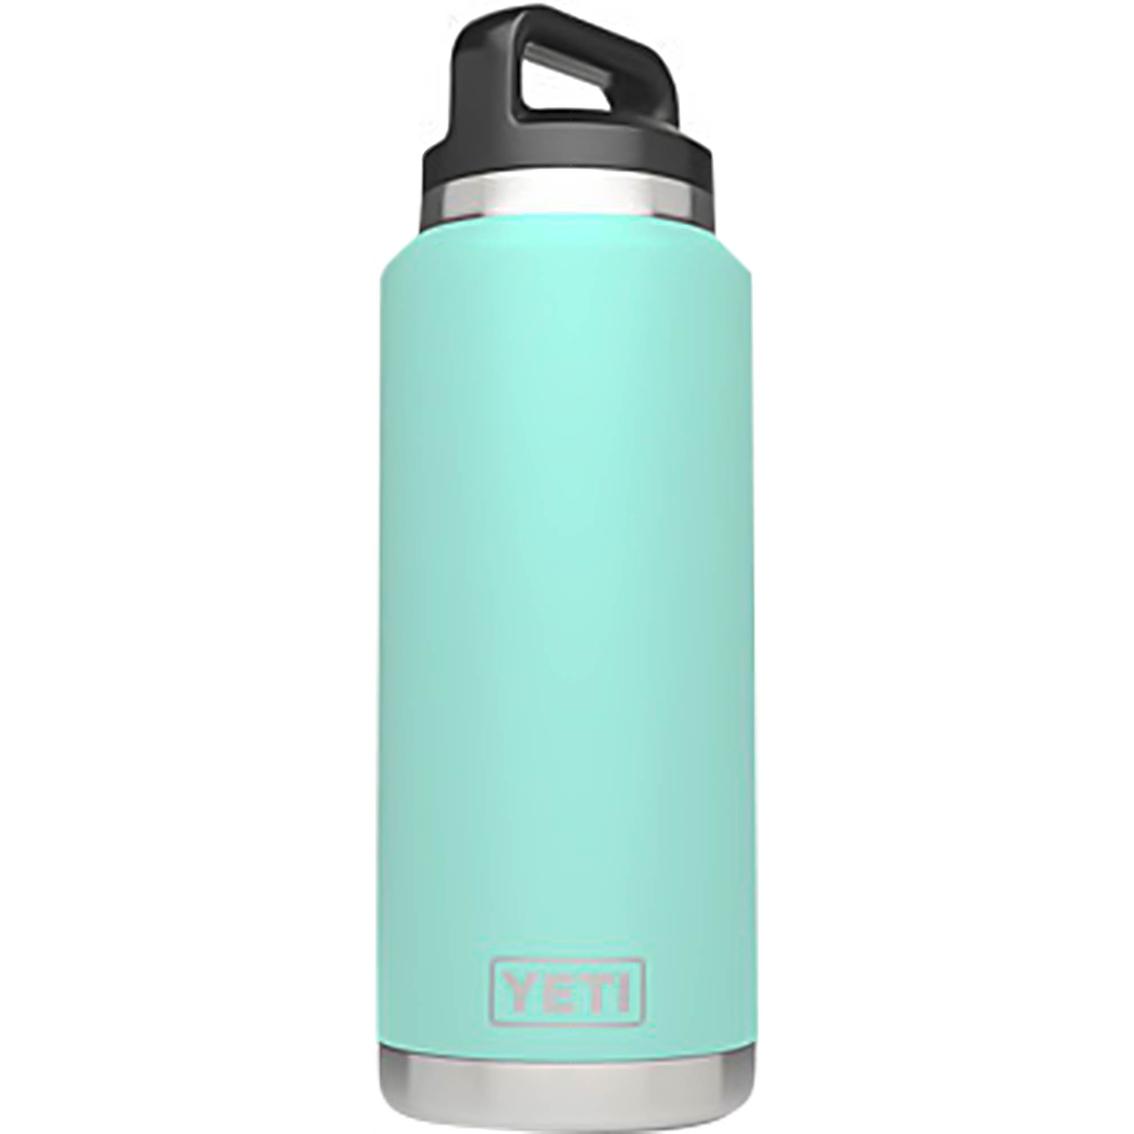 3c183679842 Yeti 36 Oz. Rambler Bottle | Hydration | Sports & Outdoors | Shop ...